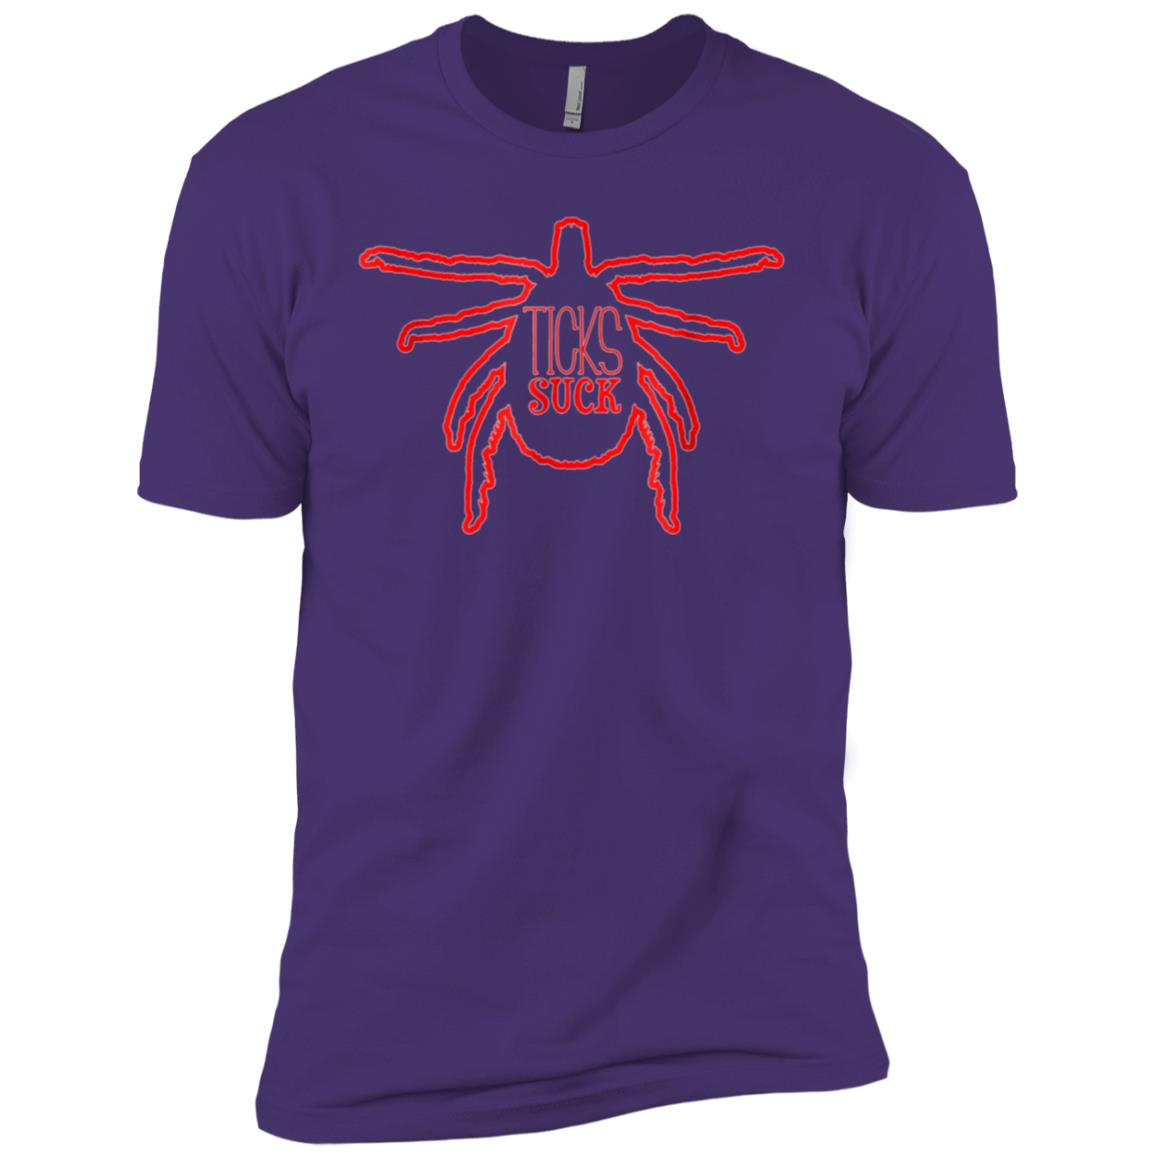 Ticks Suck; Funny Parasite Camping For Campers Men Short Sleeve T-Shirt